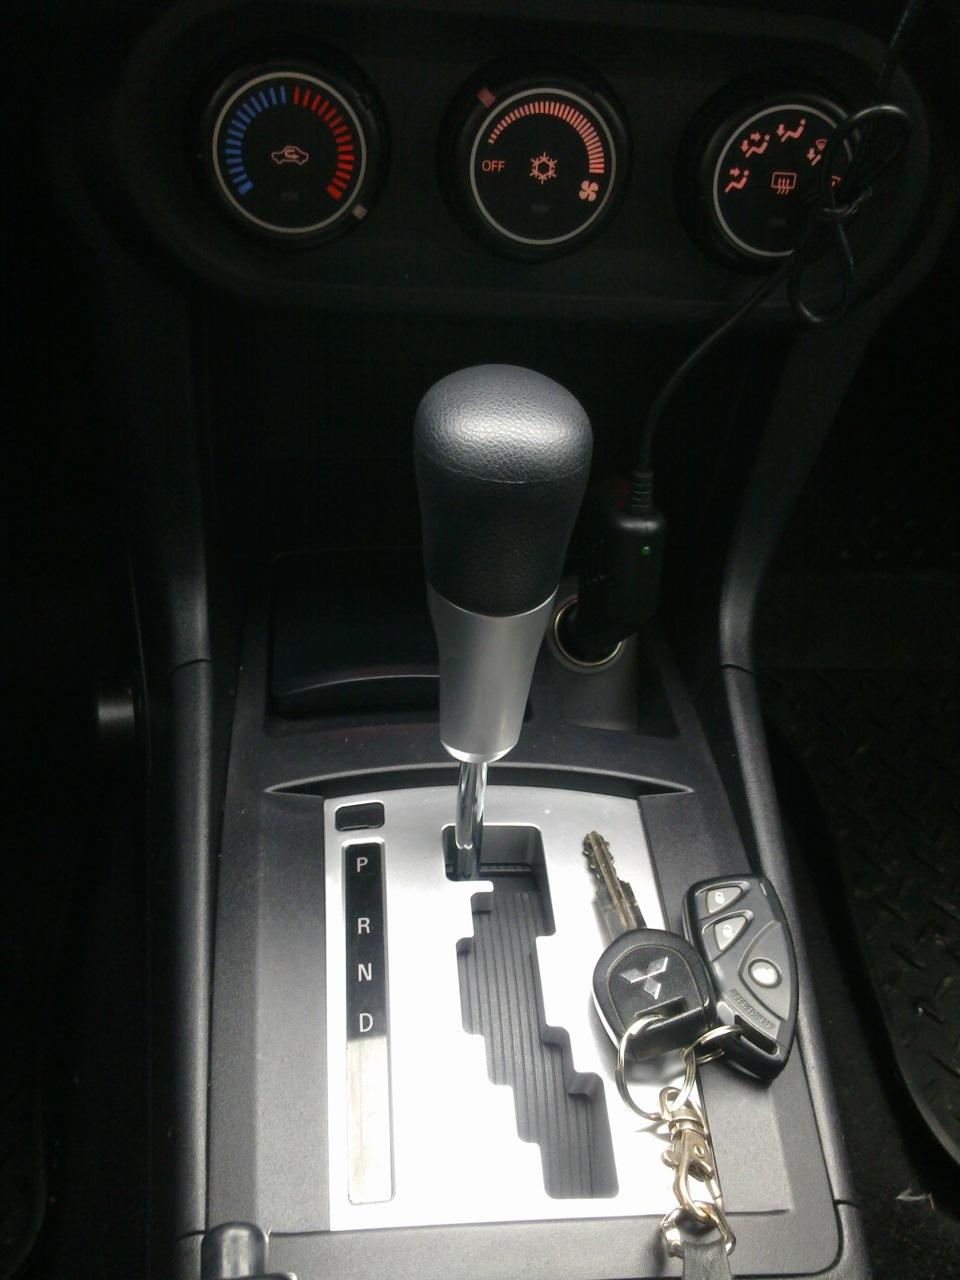 Mаслo в АКПП Lancer x 1.5 когда и сколько ? - бортжурнал Mitsubishi Lancer 1,5 ZenGo 2008 года на DRIVE2